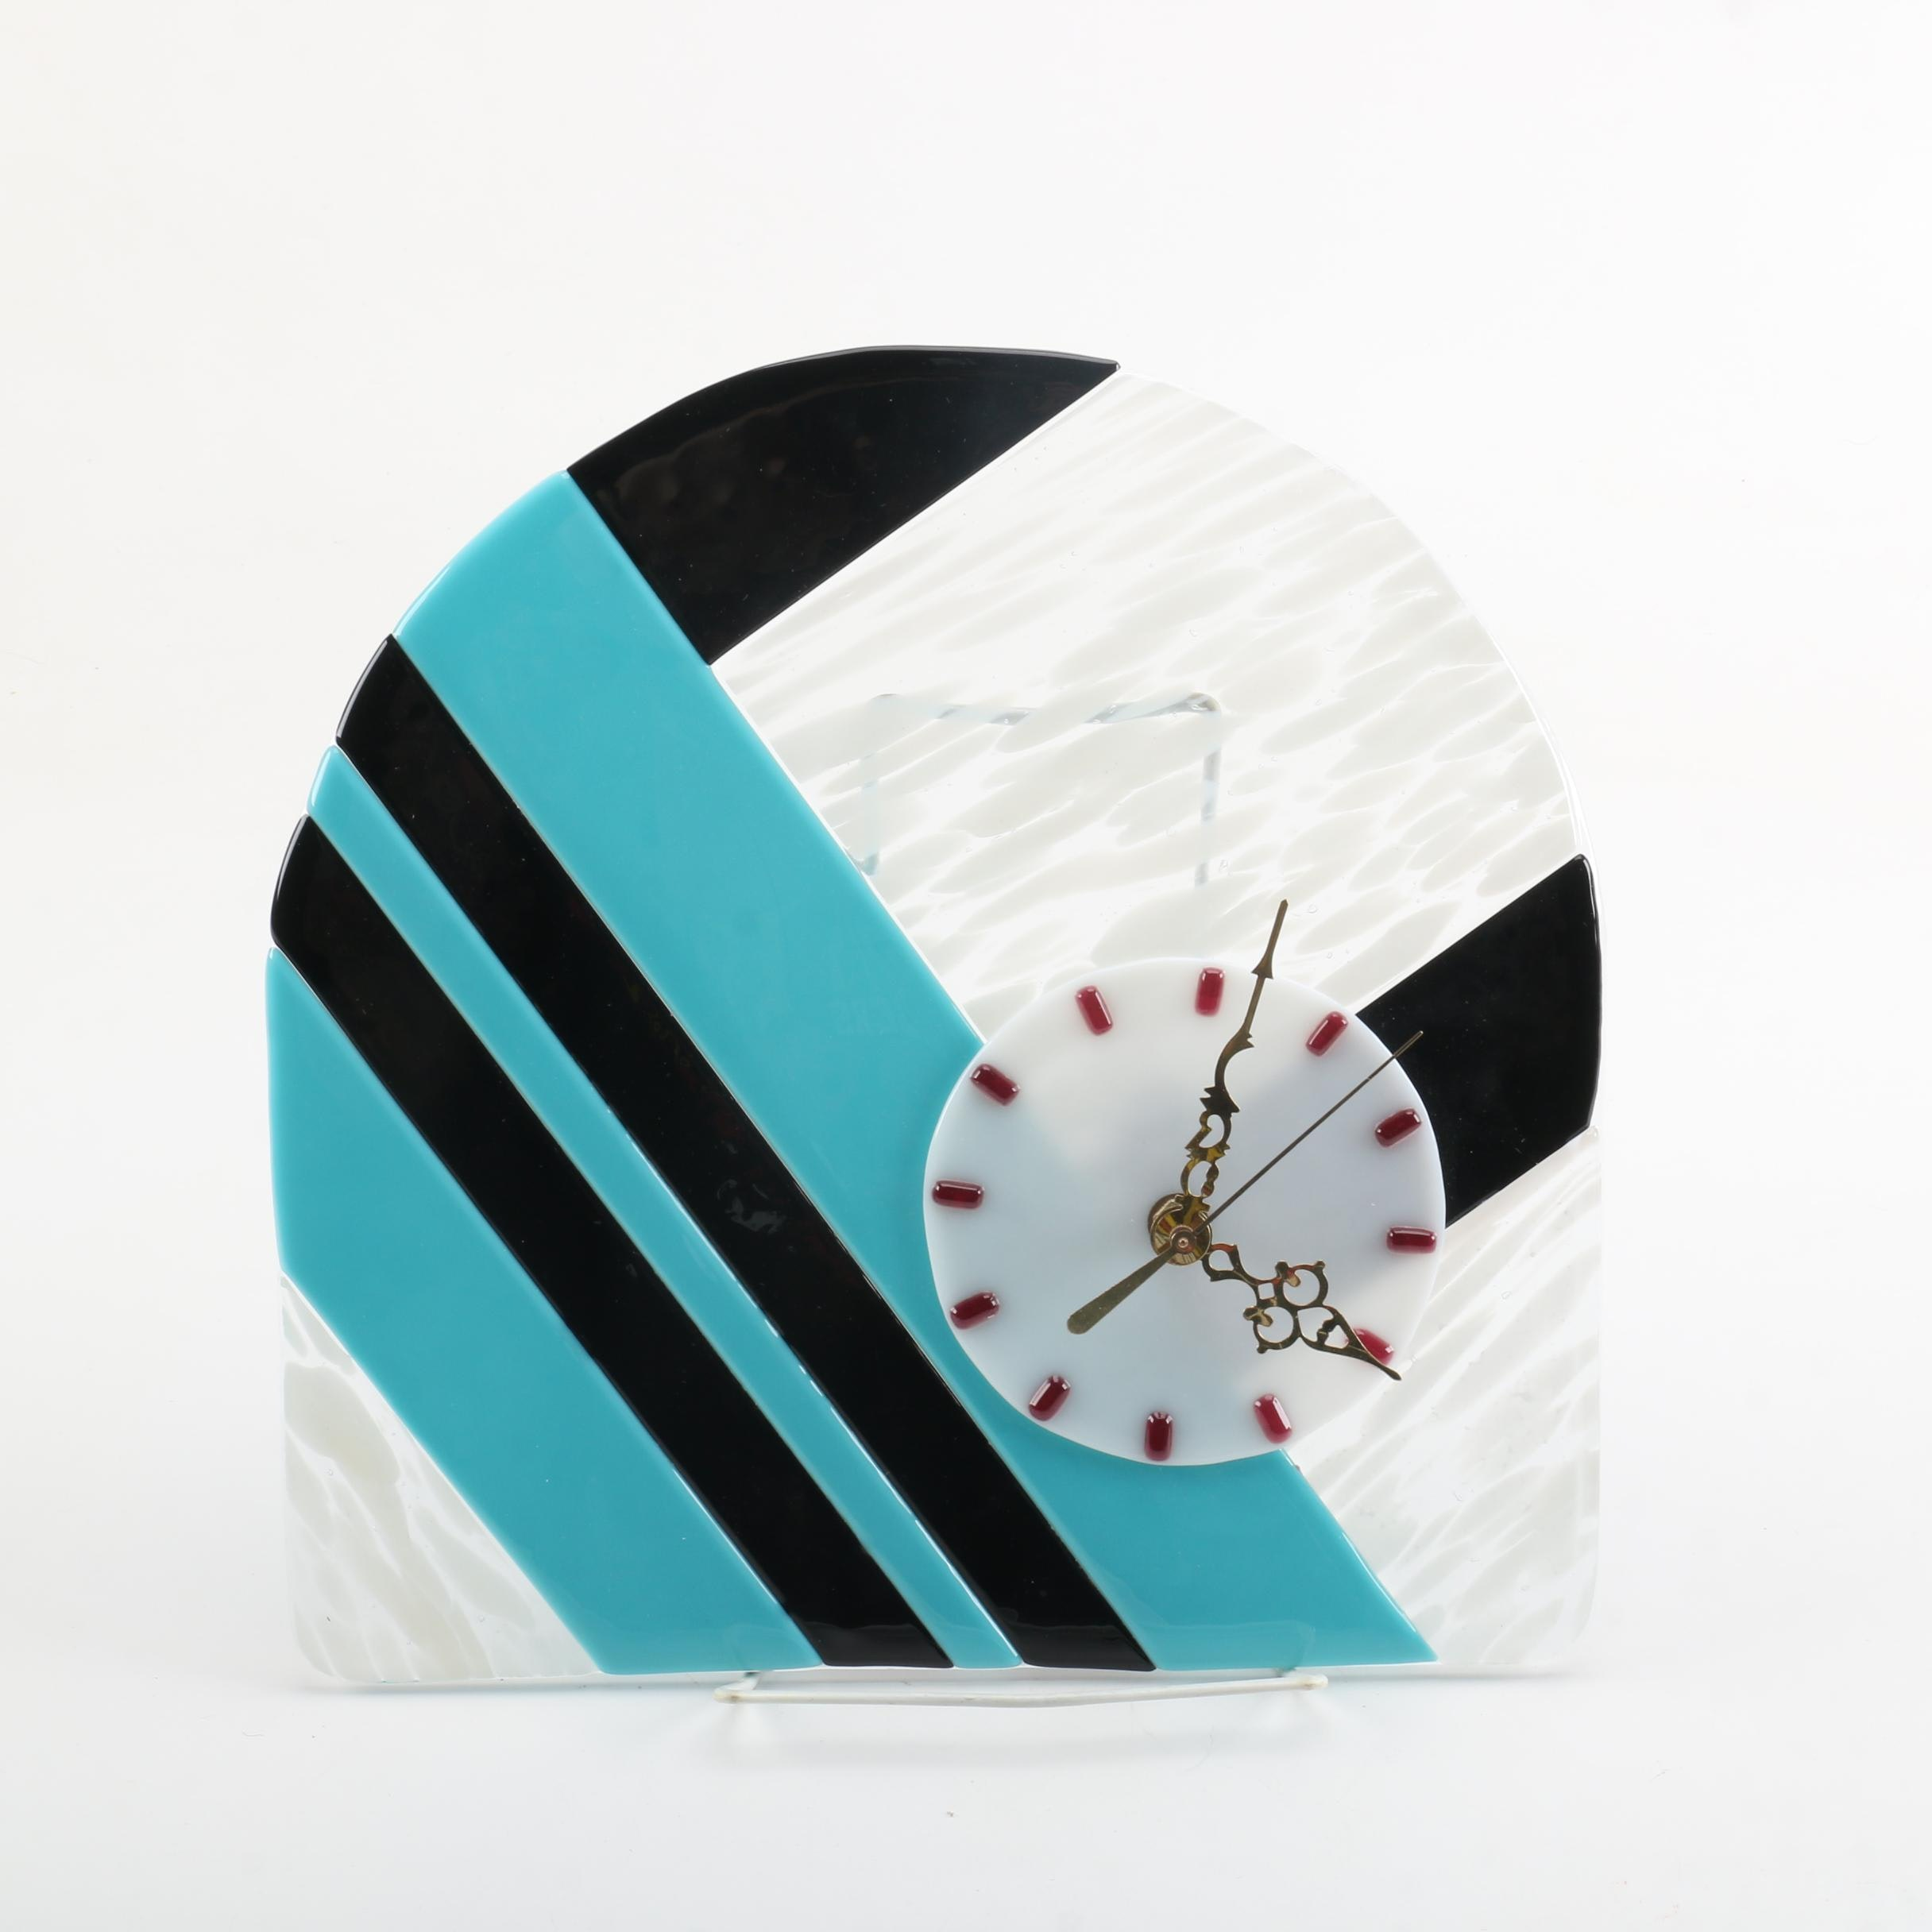 Art-Deco Inspired Clock